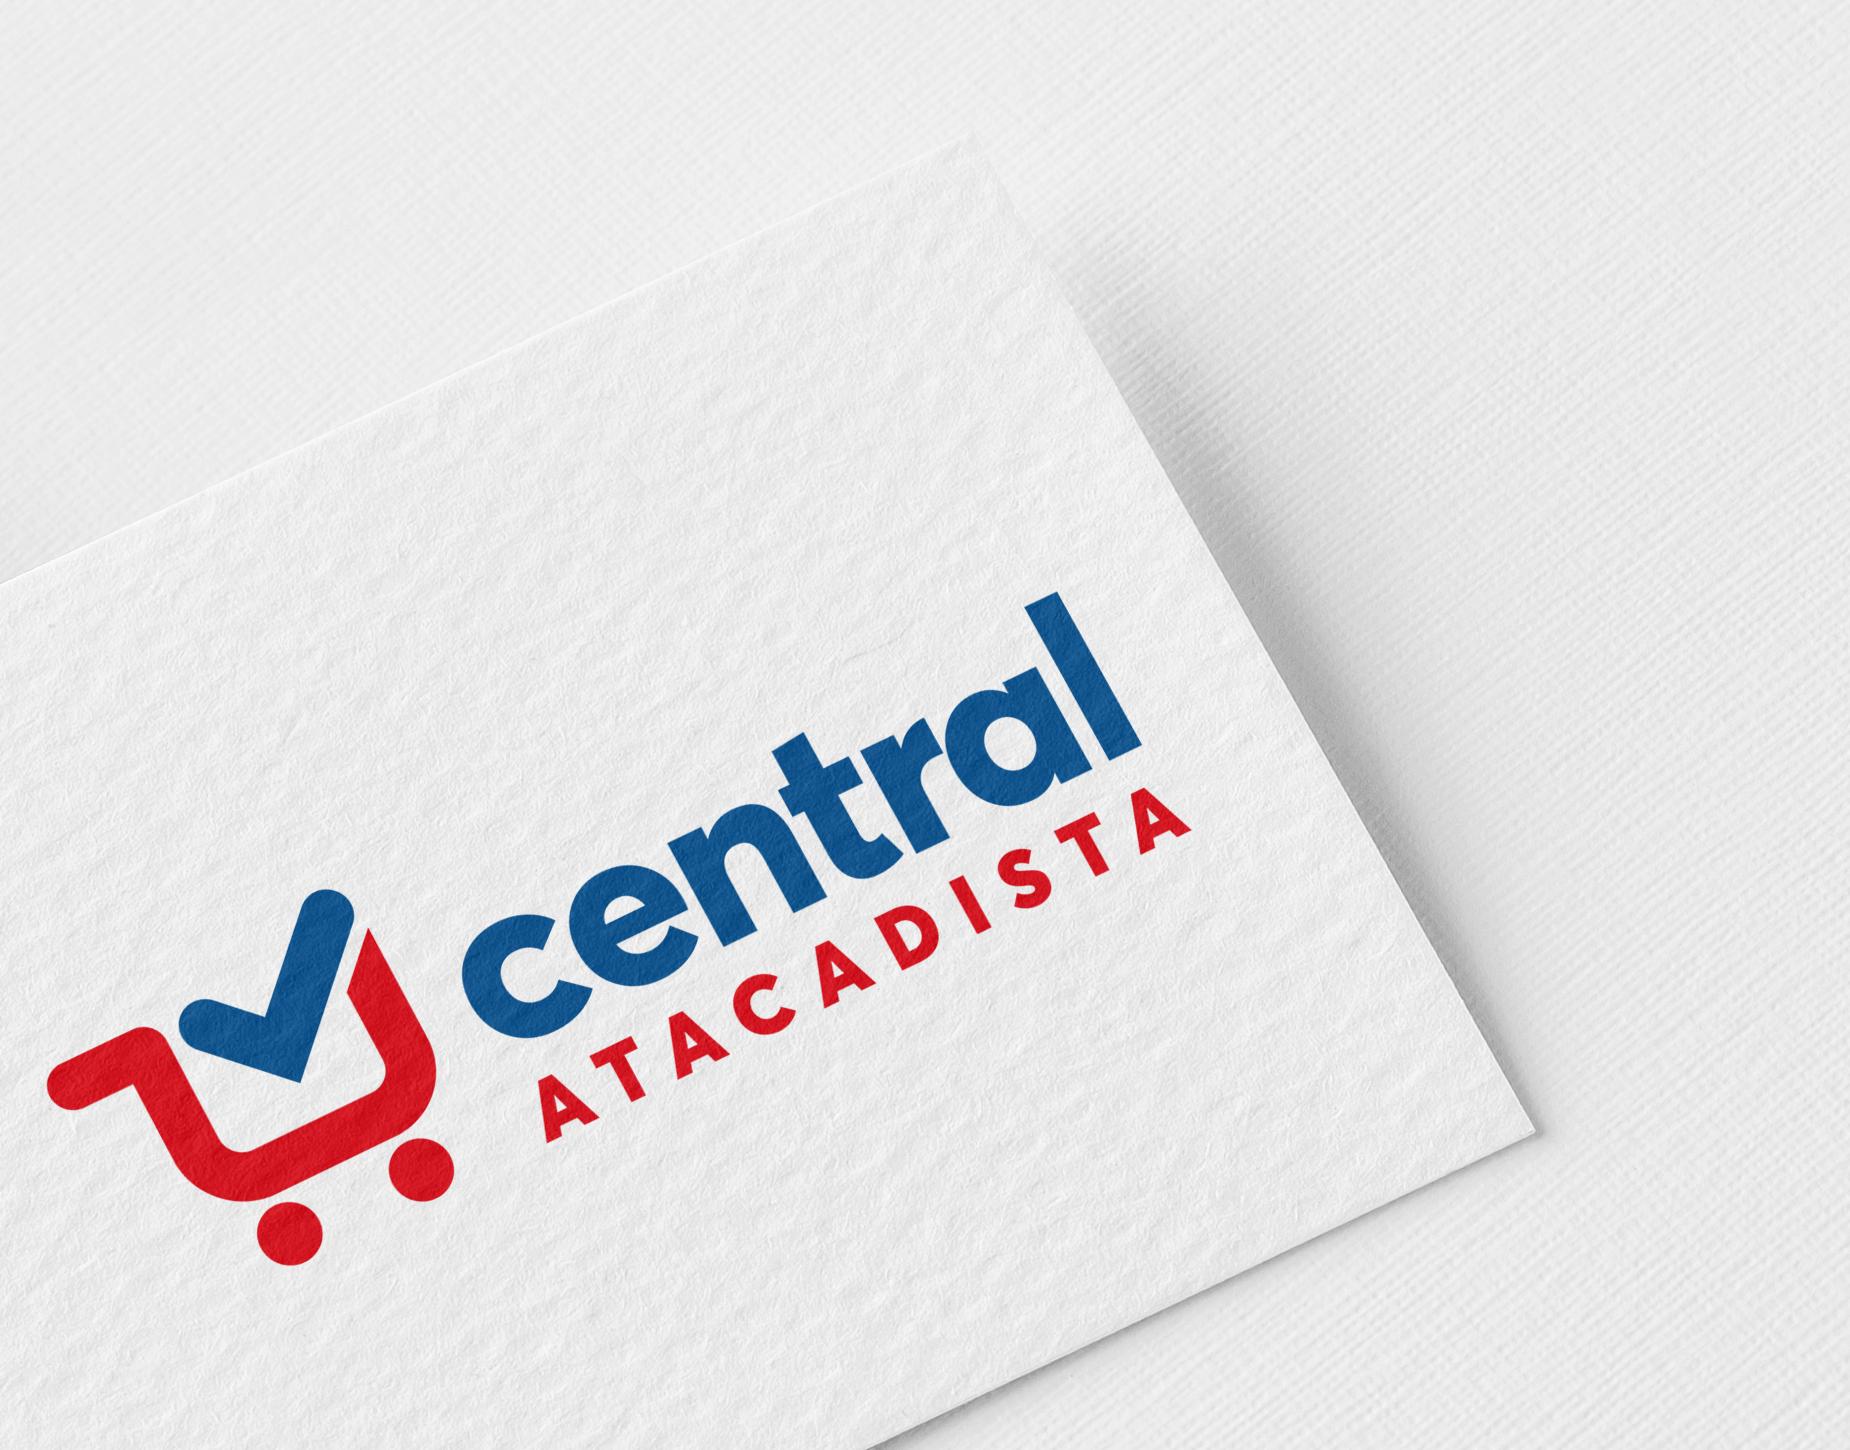 LOGO-CENTRAL-ATACADISTA_02_MOCKUP